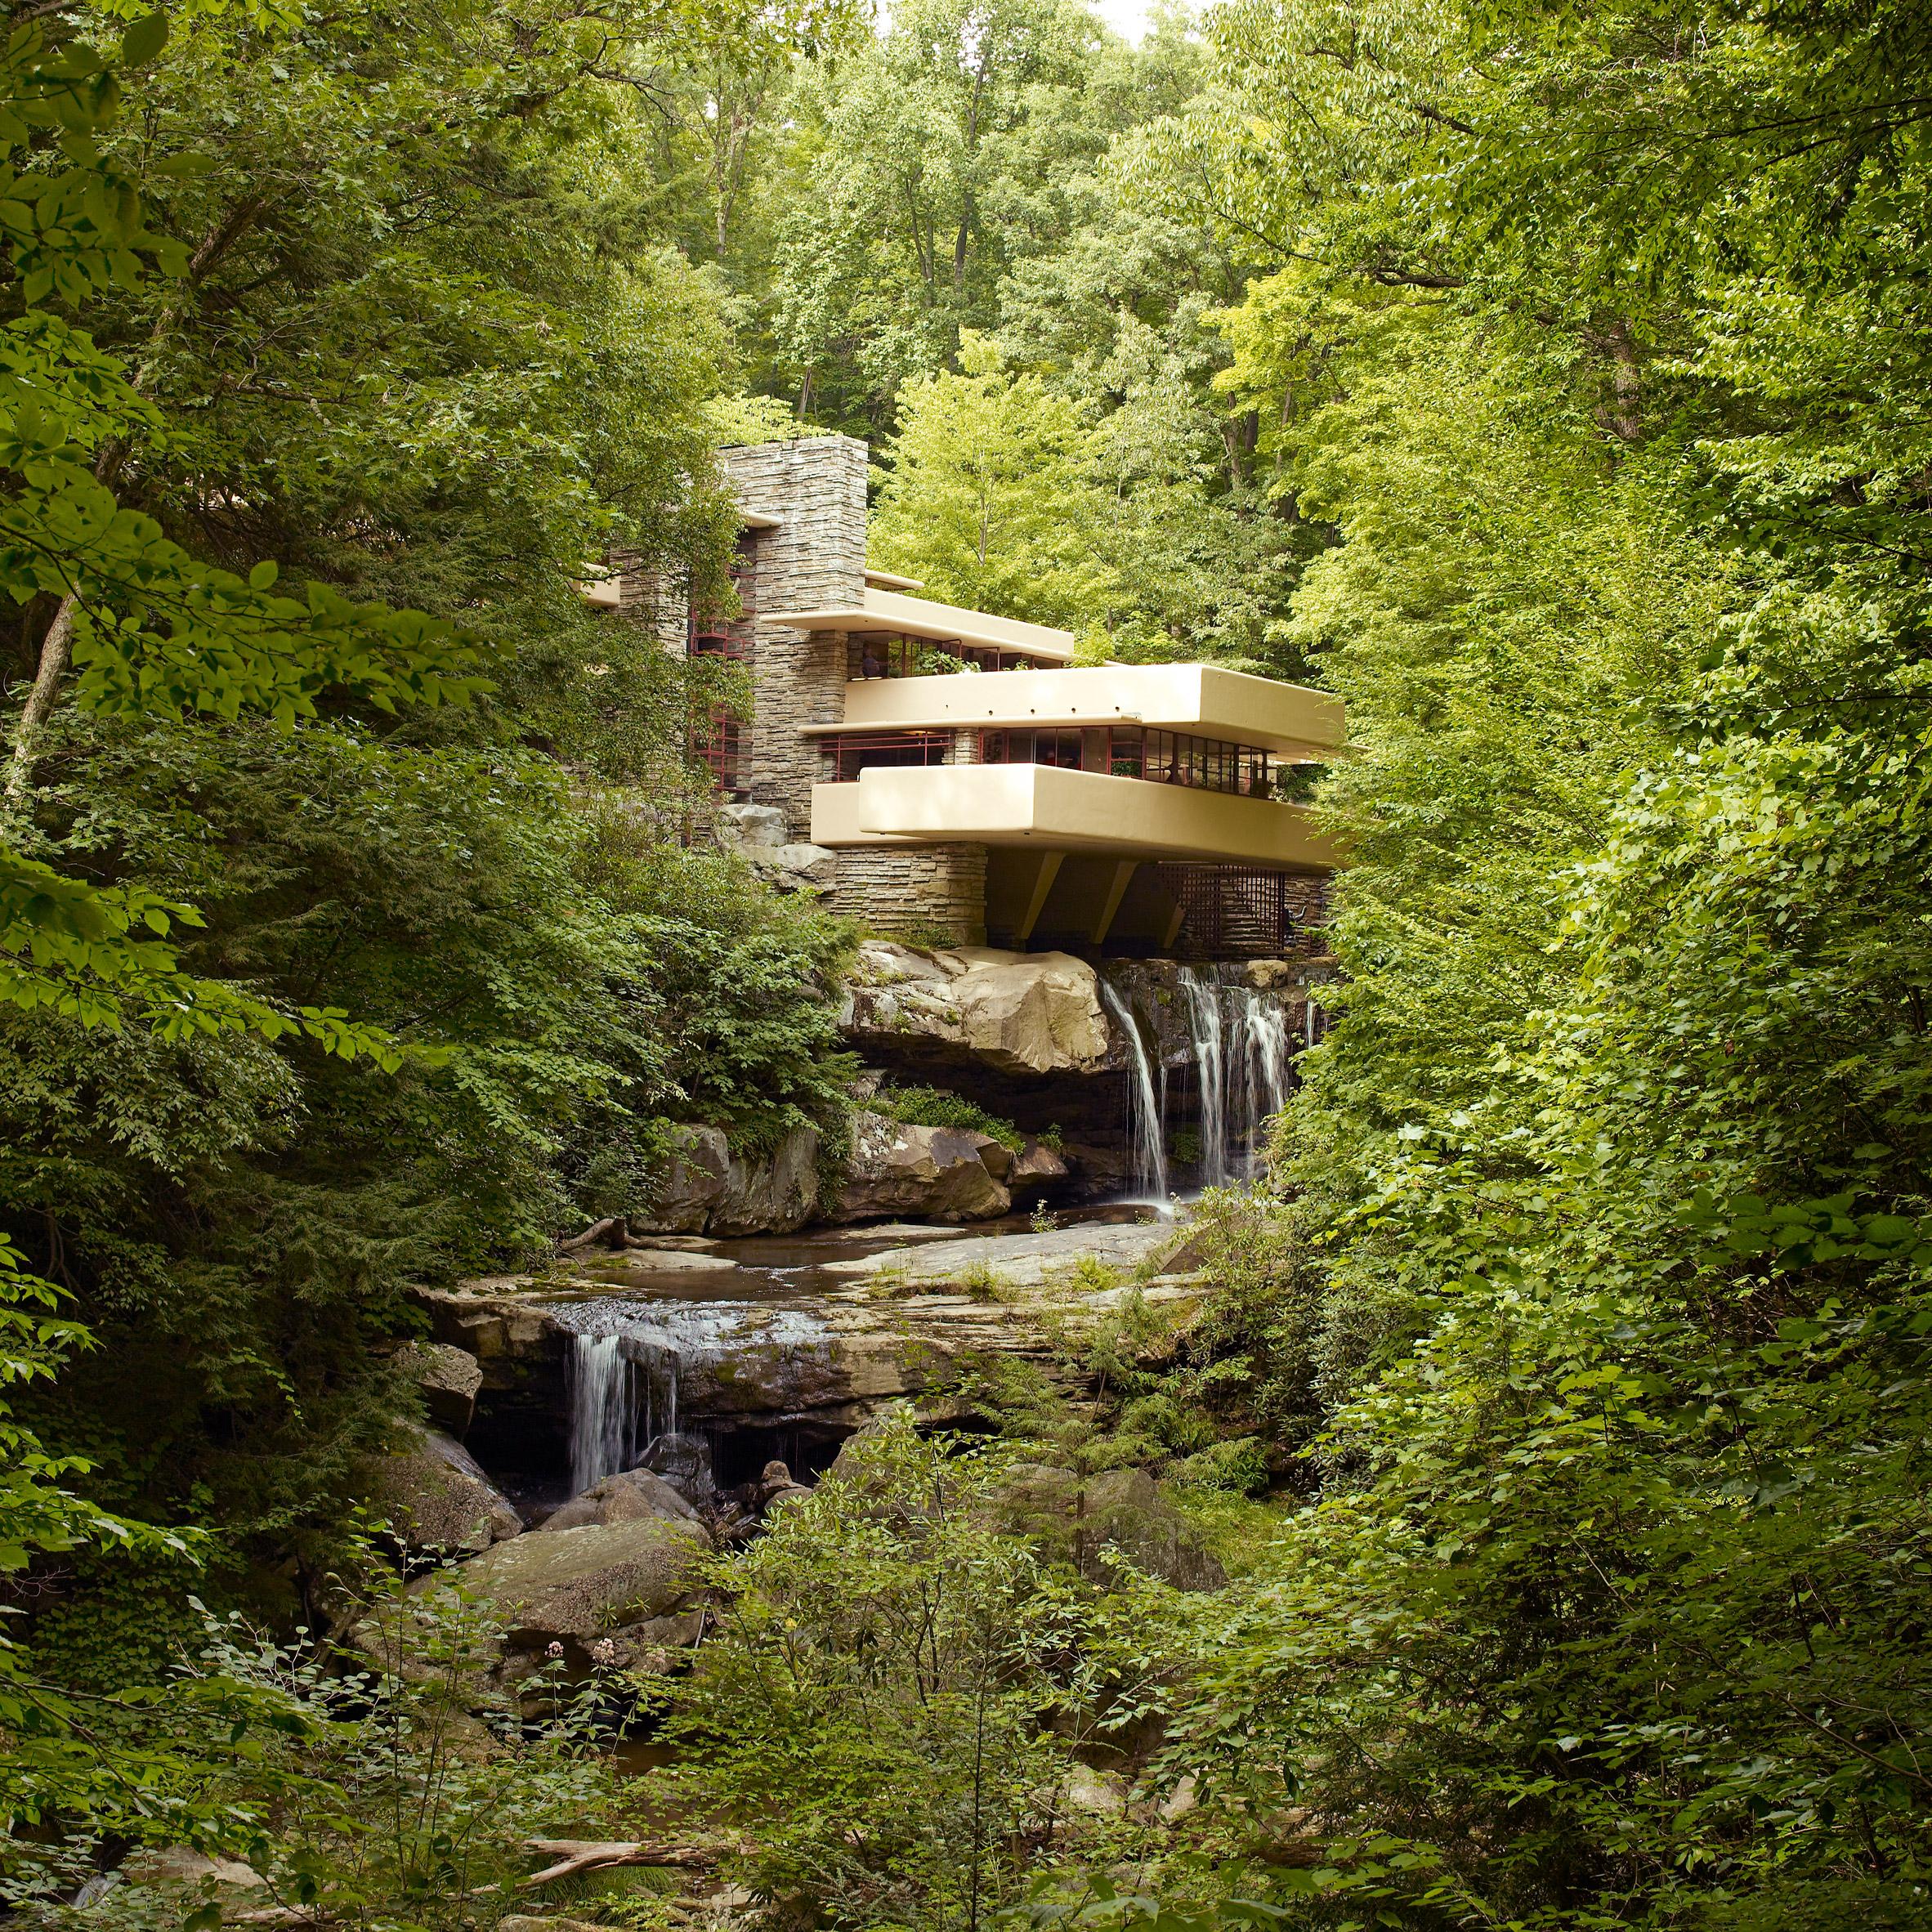 Waterfall architecture: Fallingwater by Frank Lloyd Wright